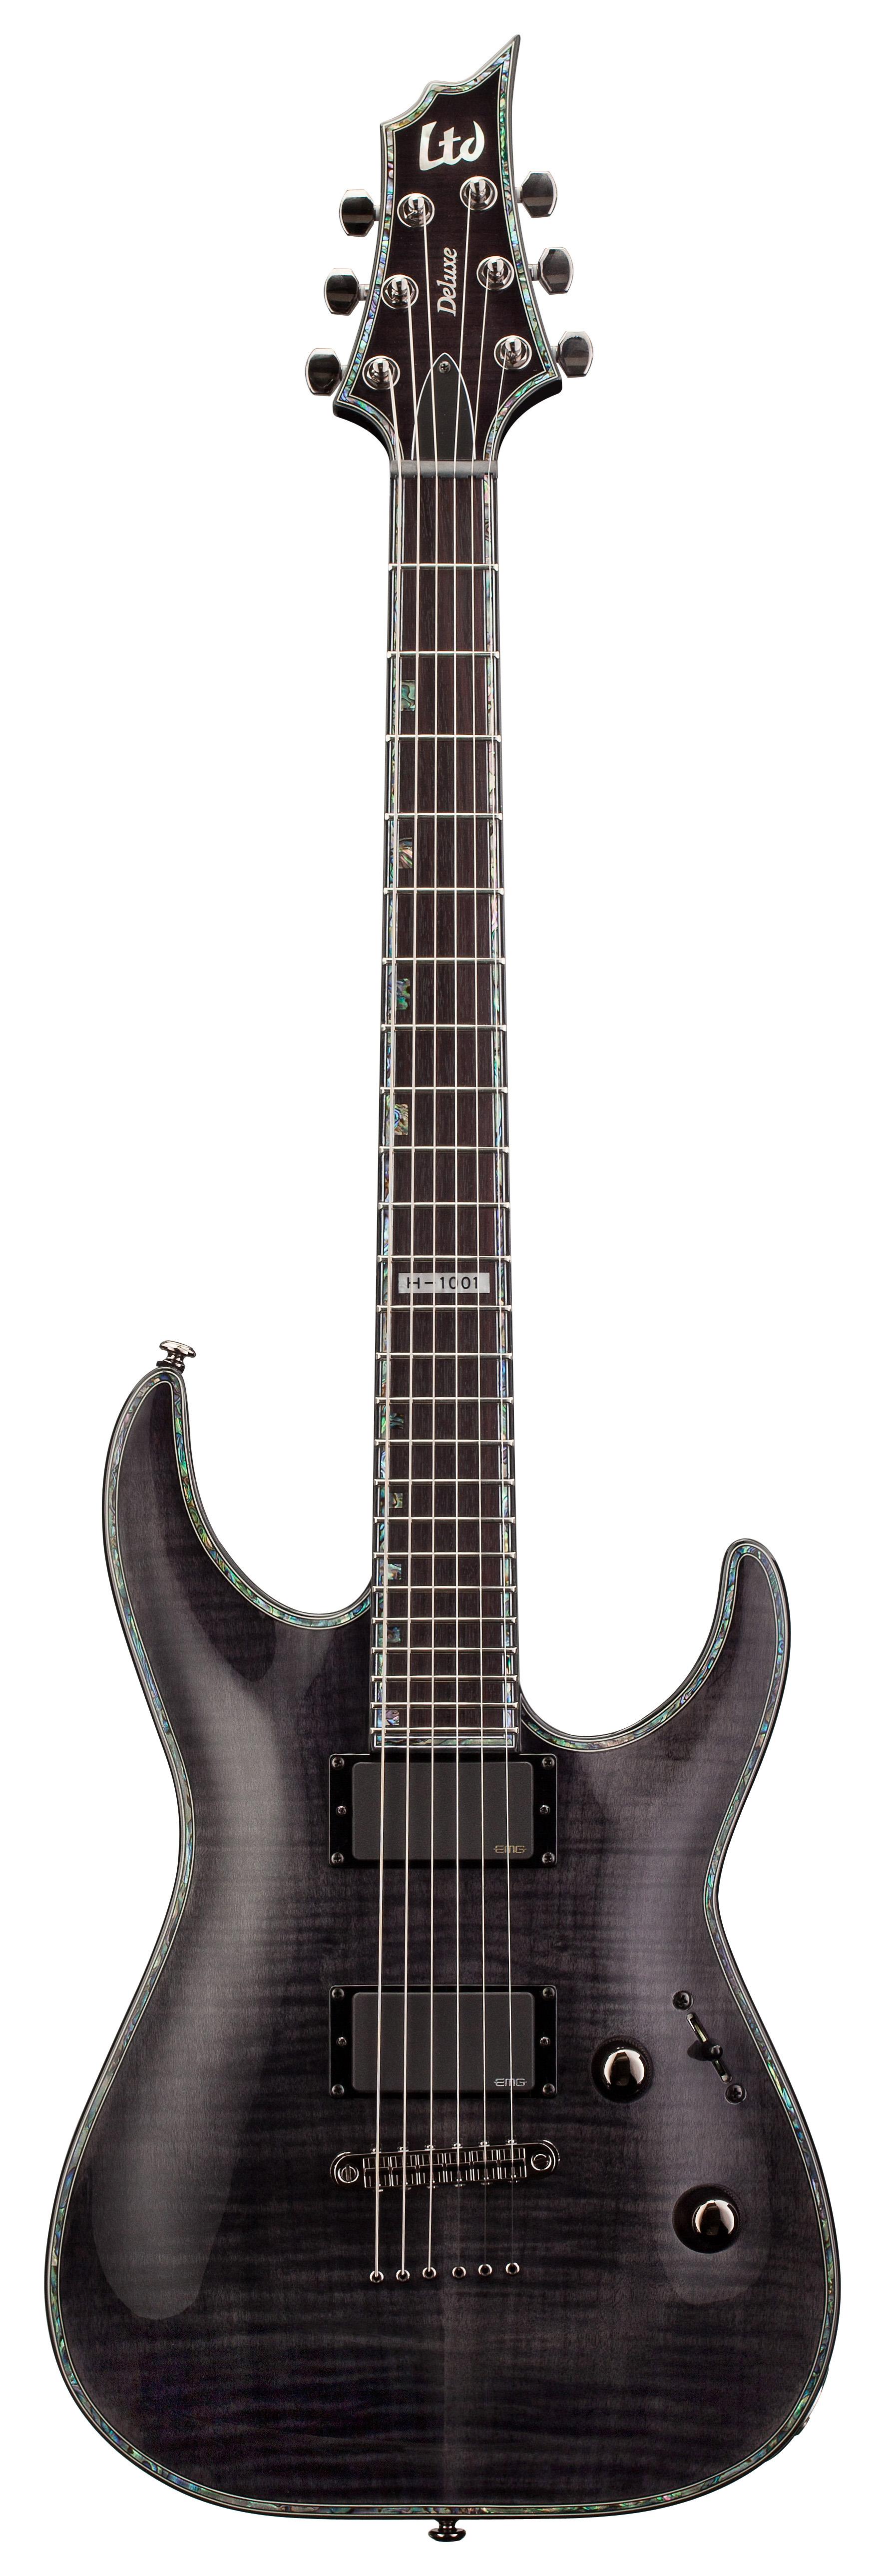 esp ltd h 1001 fm h series electric guitar see thru black finish flamed maple top mahogany. Black Bedroom Furniture Sets. Home Design Ideas